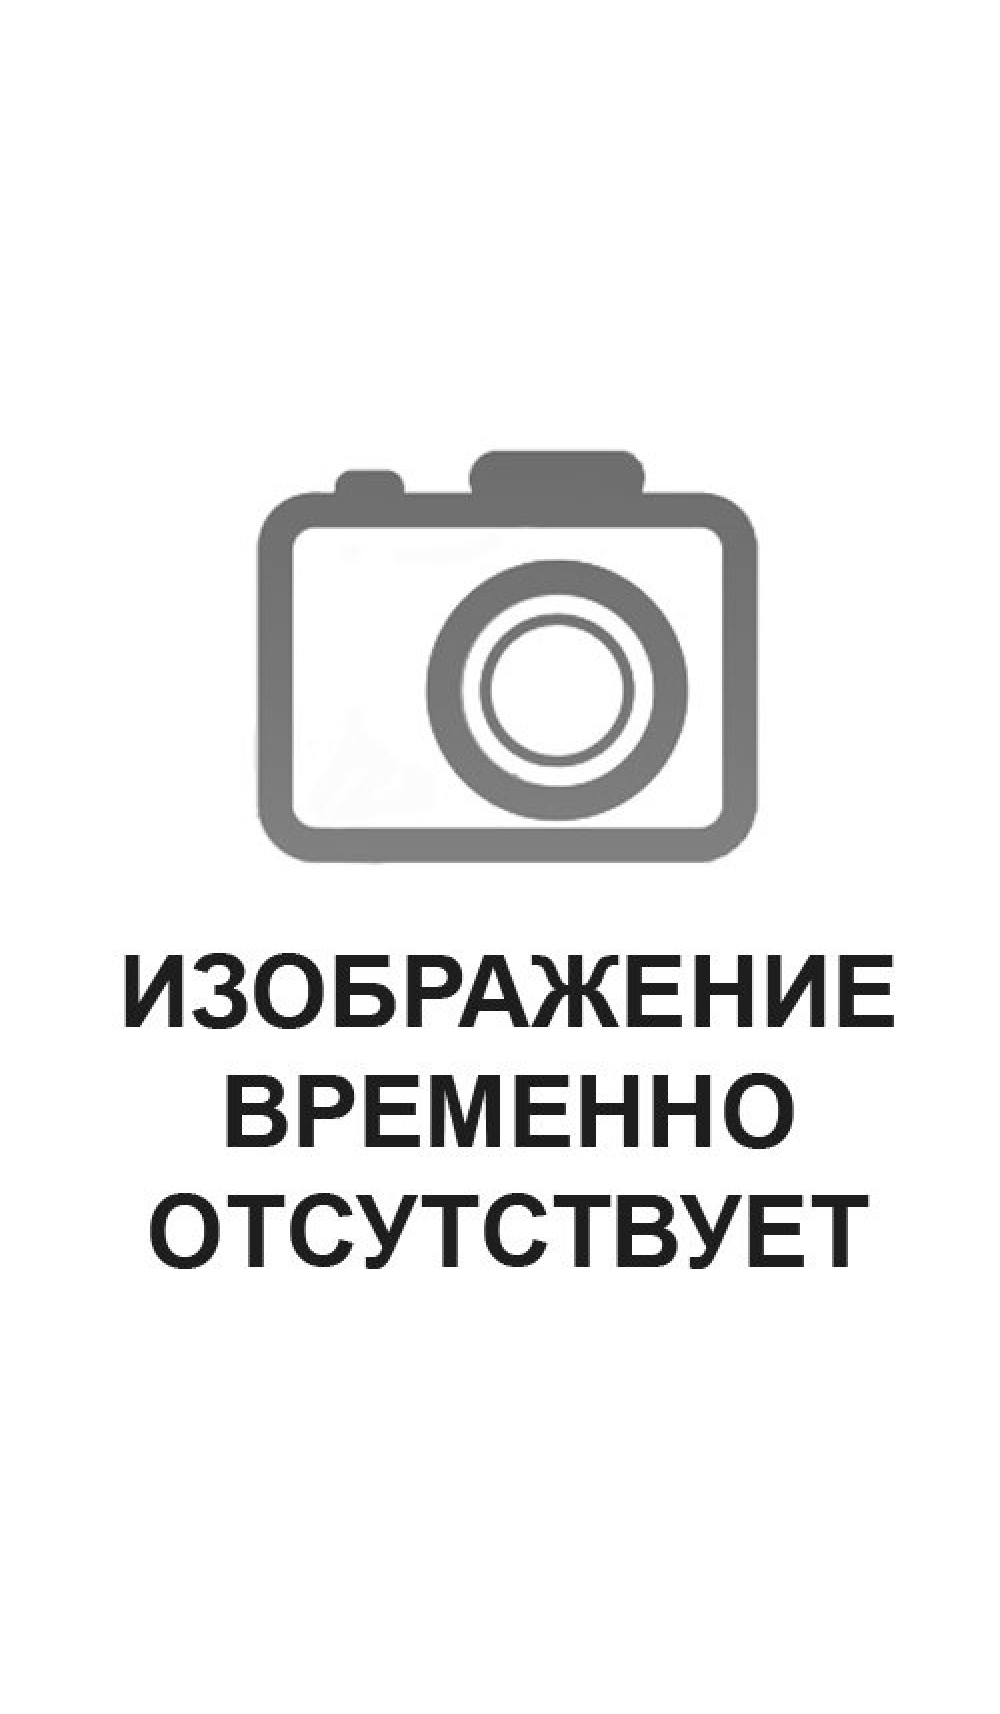 Брюки Remu с подтяжками 1475-290 Travalle — фото 1